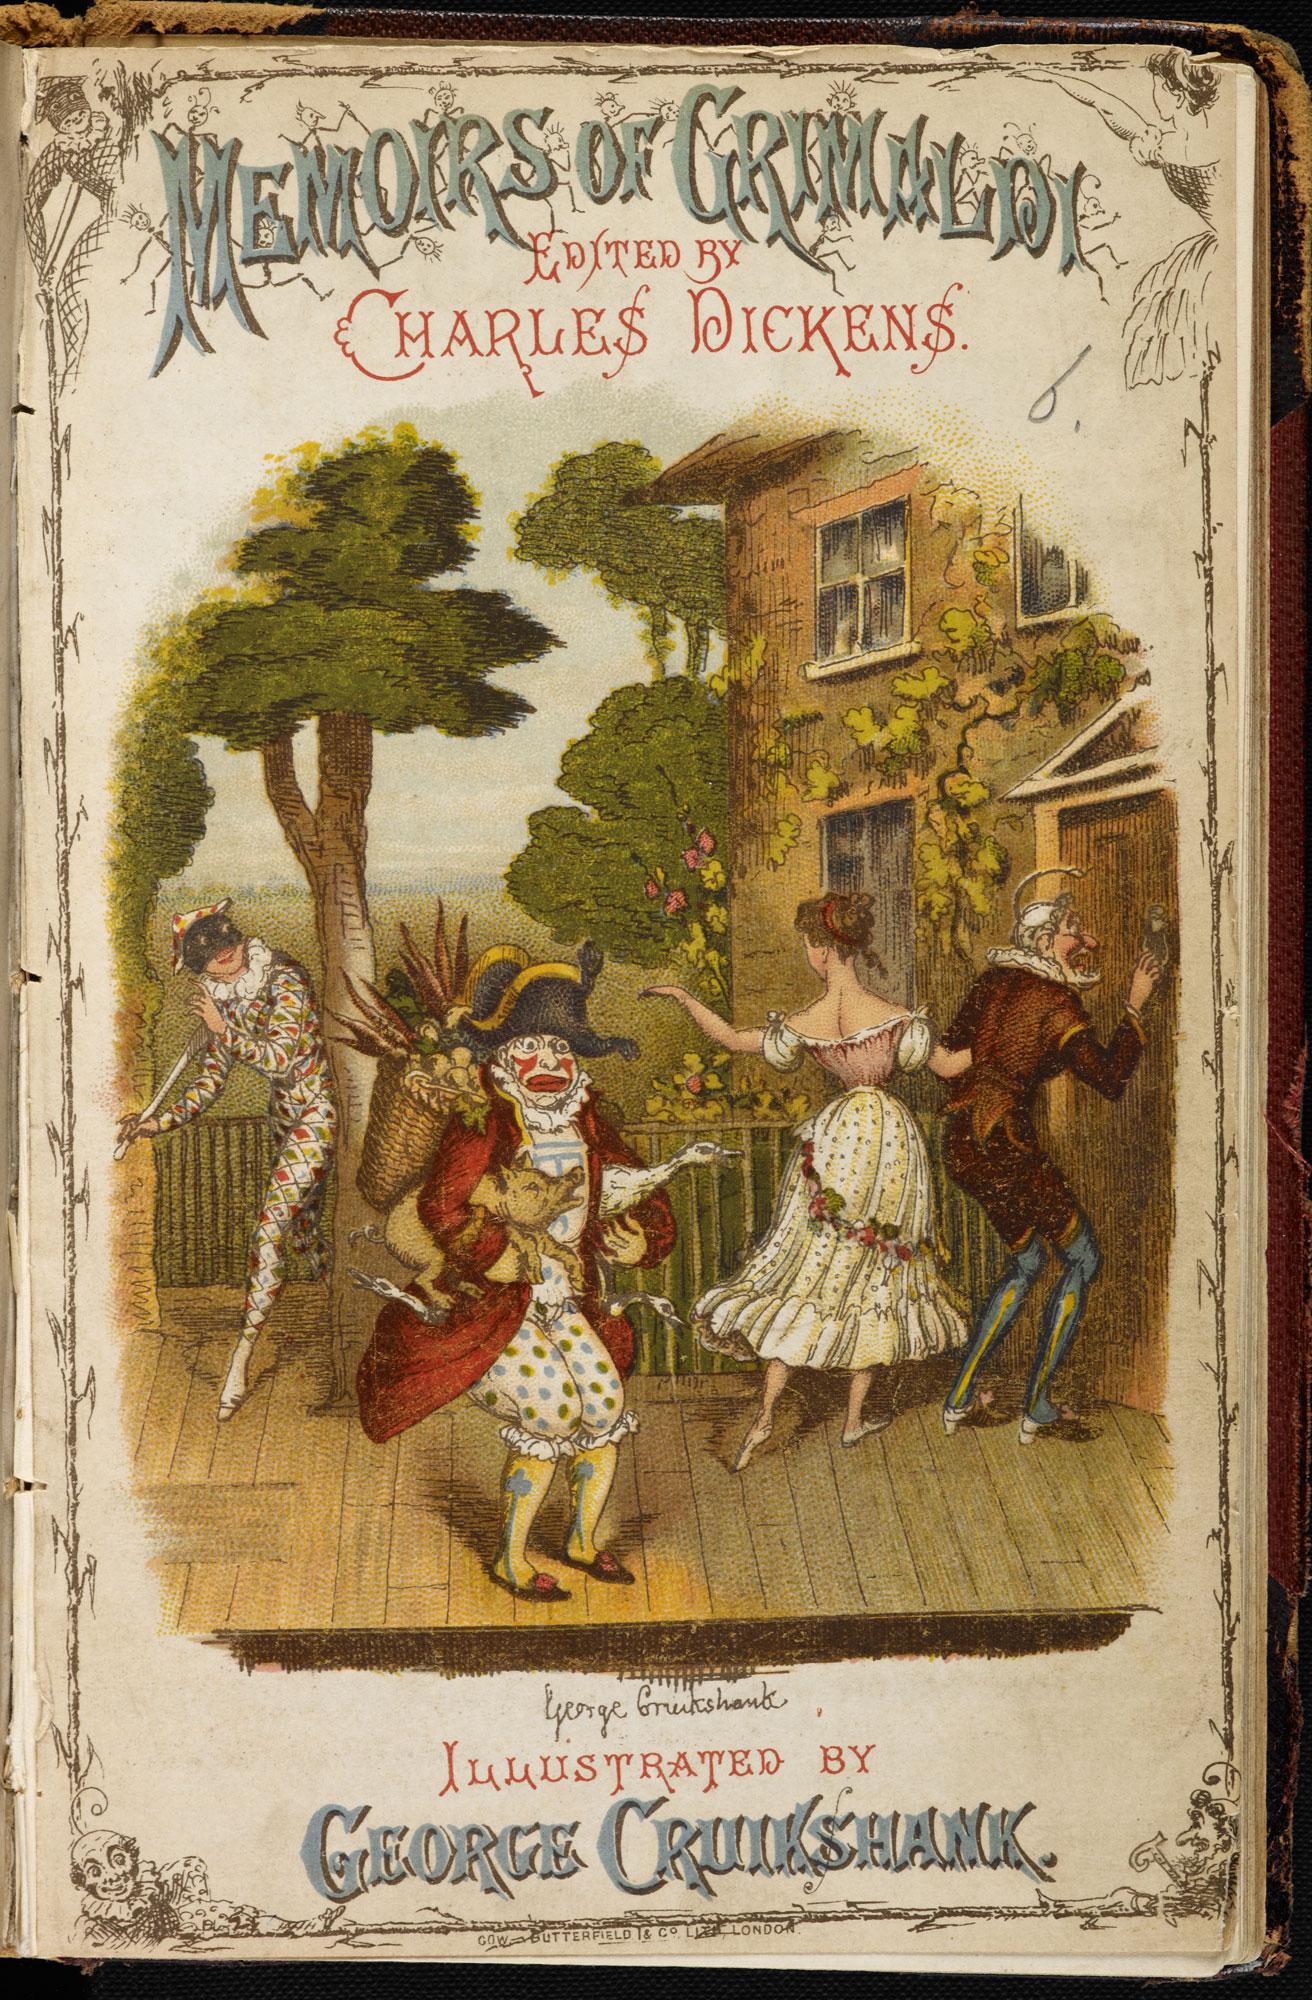 Memoirs of Joseph Grimaldi [page: title page]